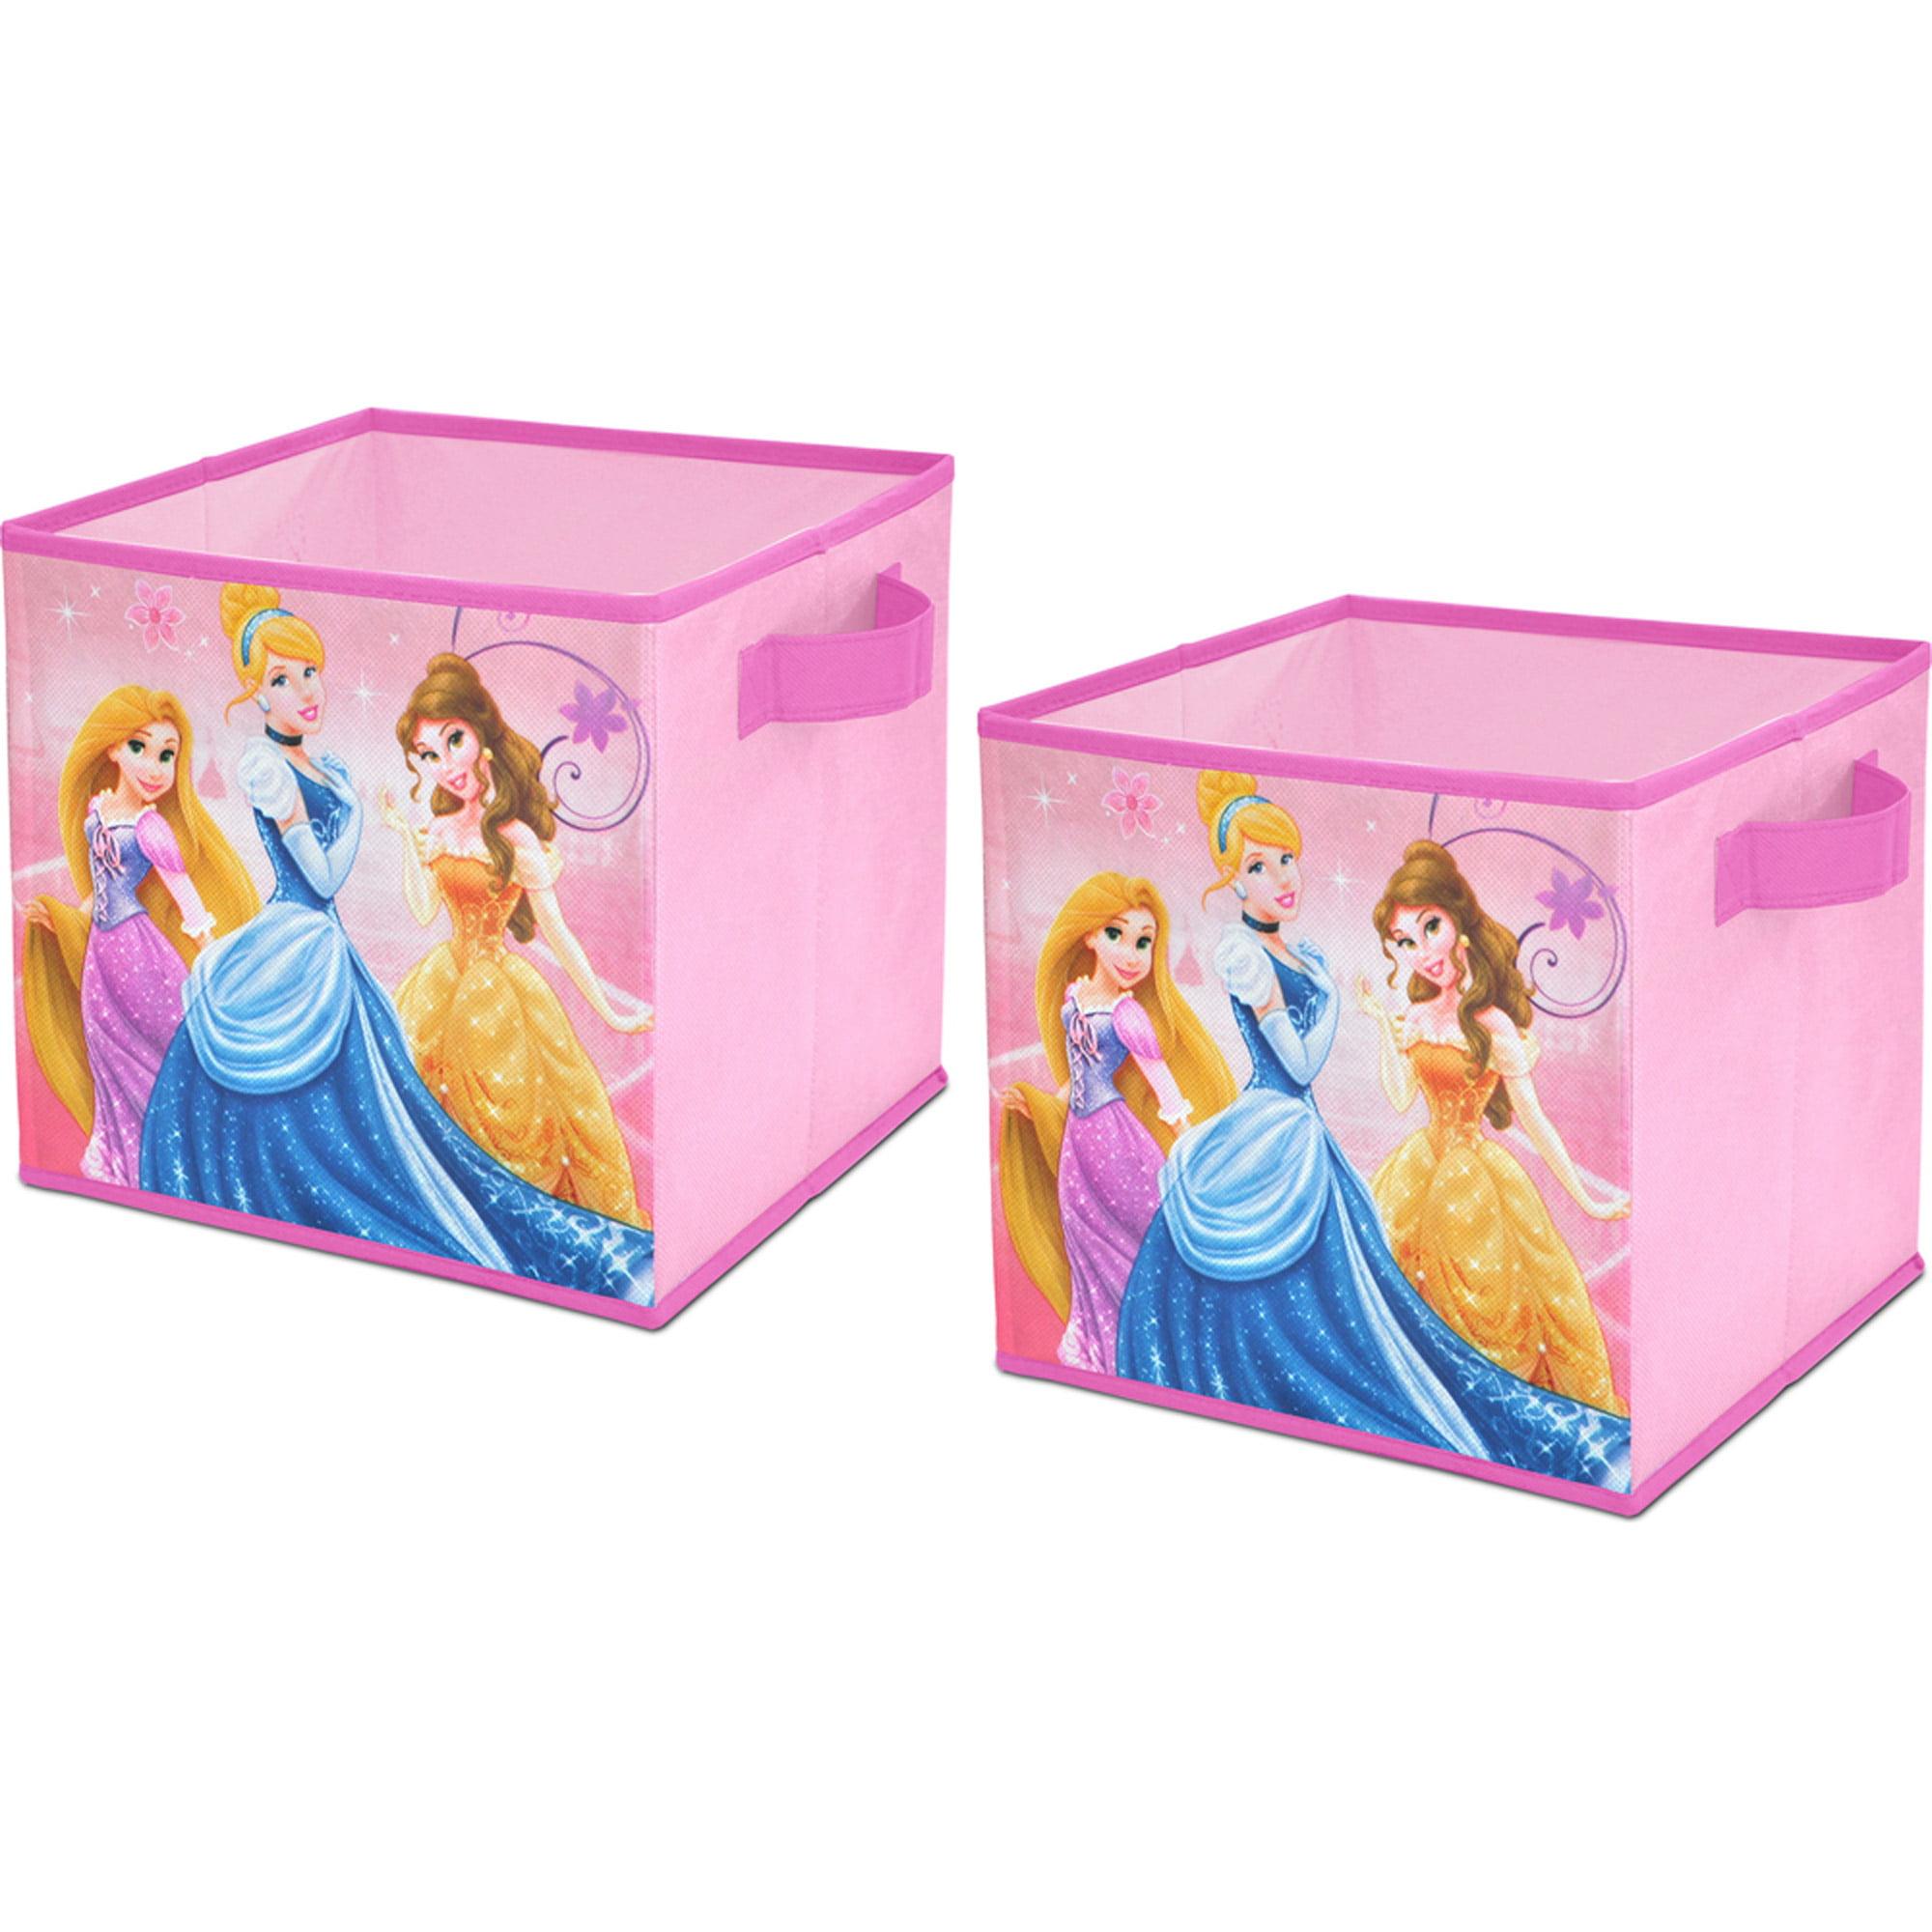 sc 1 st  Walmart & Disney Princess 2-Pack Storage Cube - Walmart.com Aboutintivar.Com